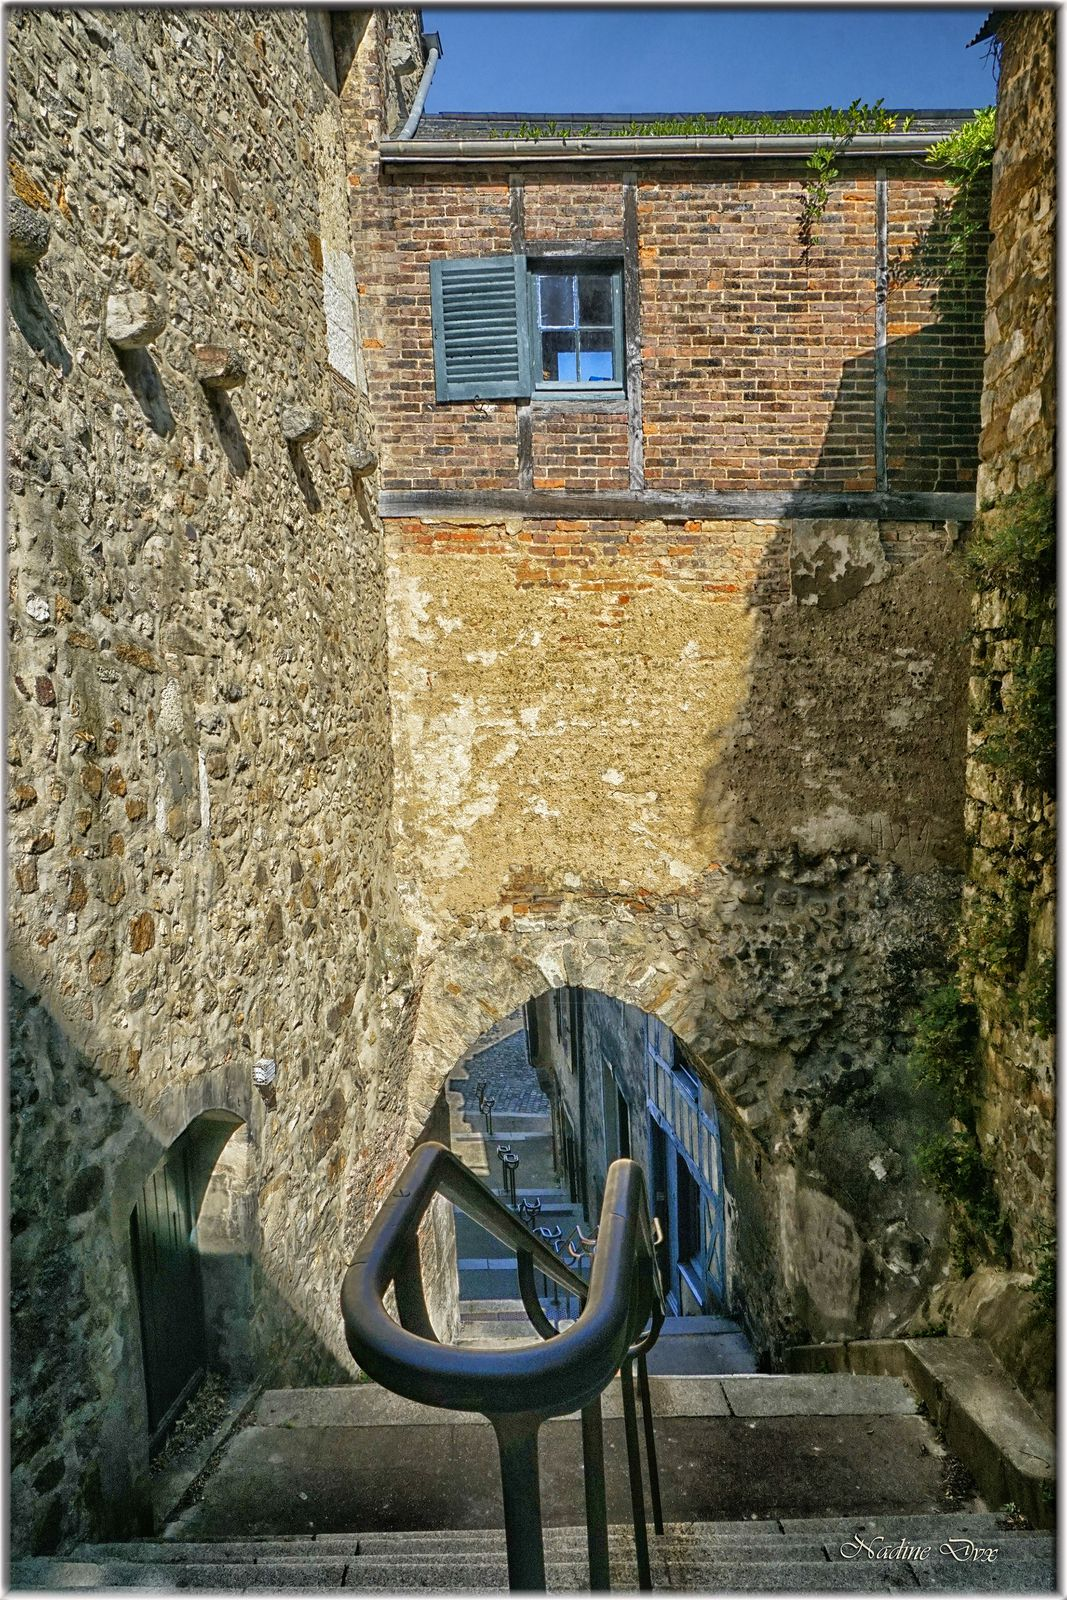 Escalier de la grande Poterne de la rue de la Verrerie à la rue Saint-Pavin.